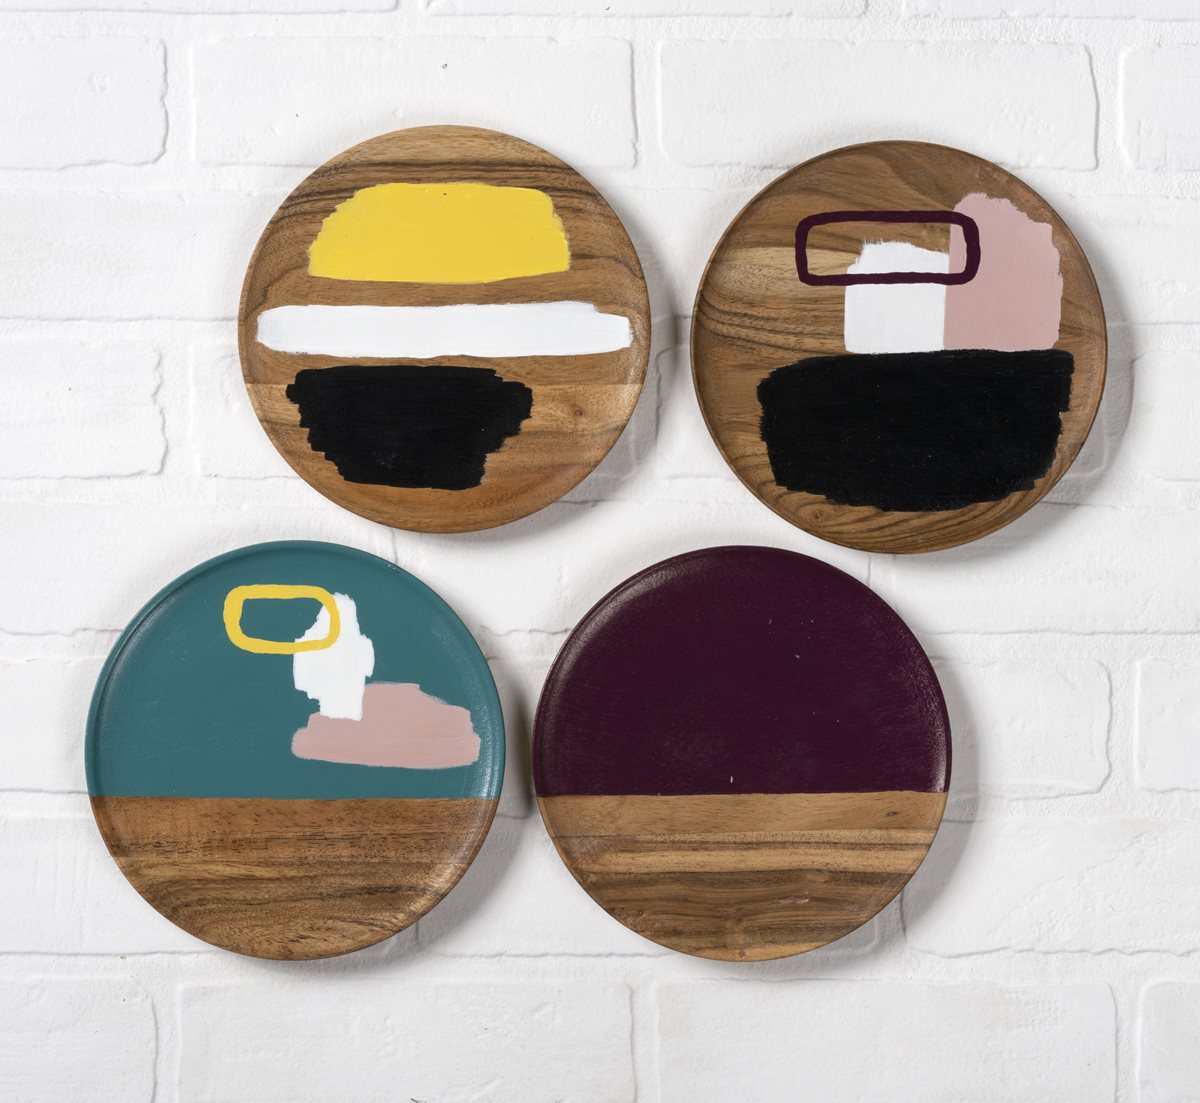 FolkArt One Gloss Wood Plates